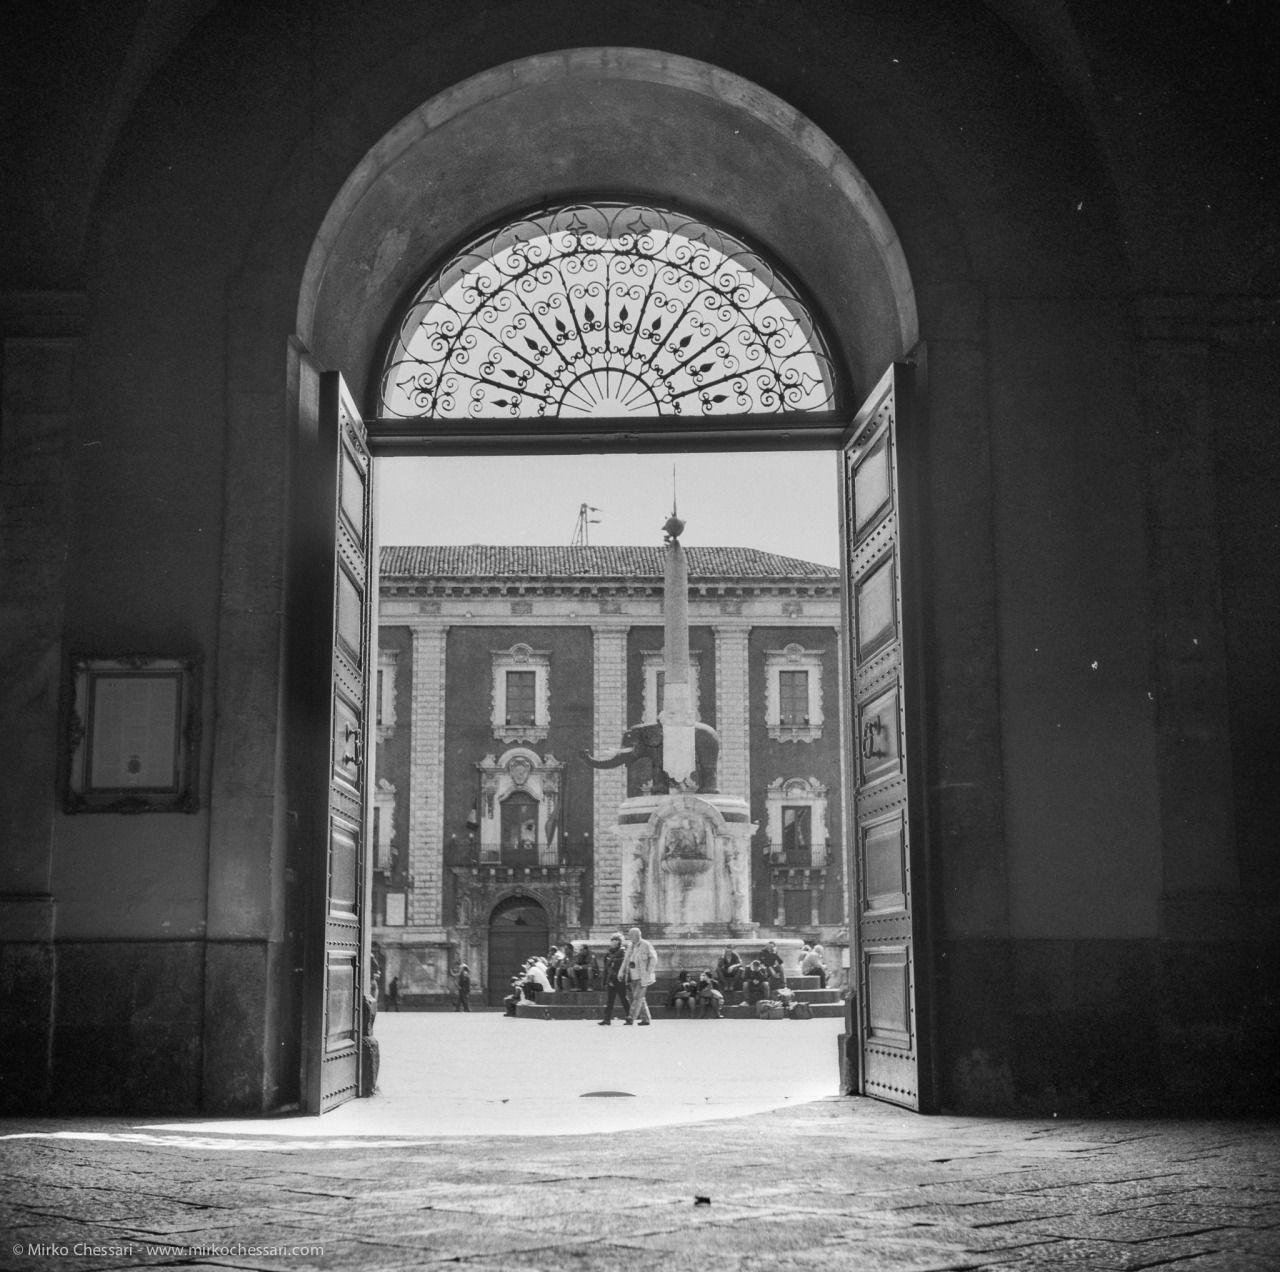 Piazza Duomo, Catania Yashica D /Fomapan 100 /Promicrol 1+146:30min @24°